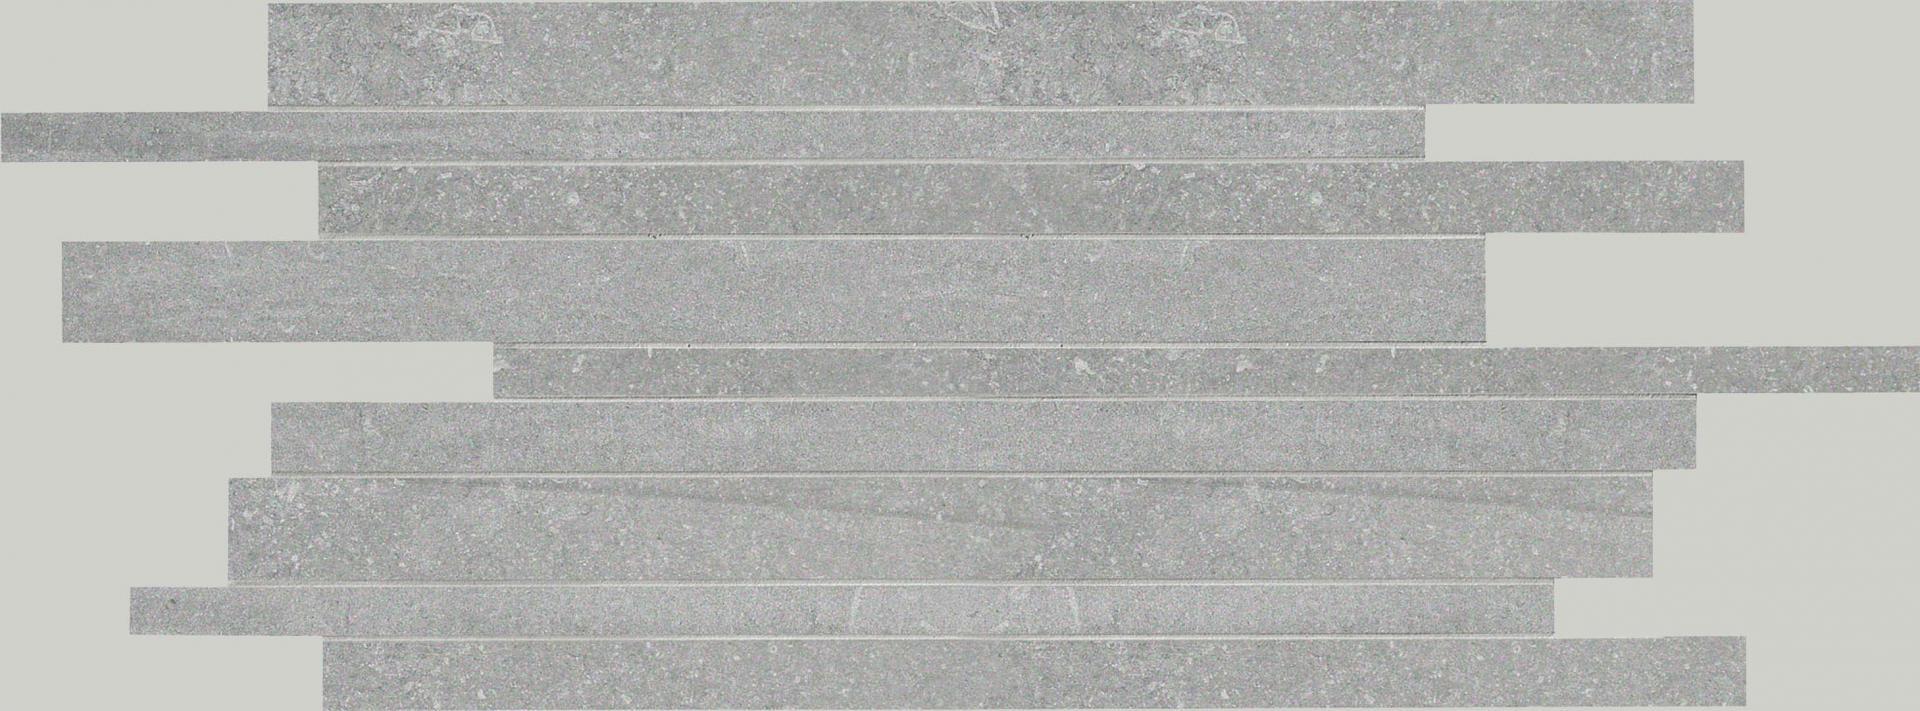 Keope BACK SILVER KE-y1T1 Strips 30X60 naturale R9